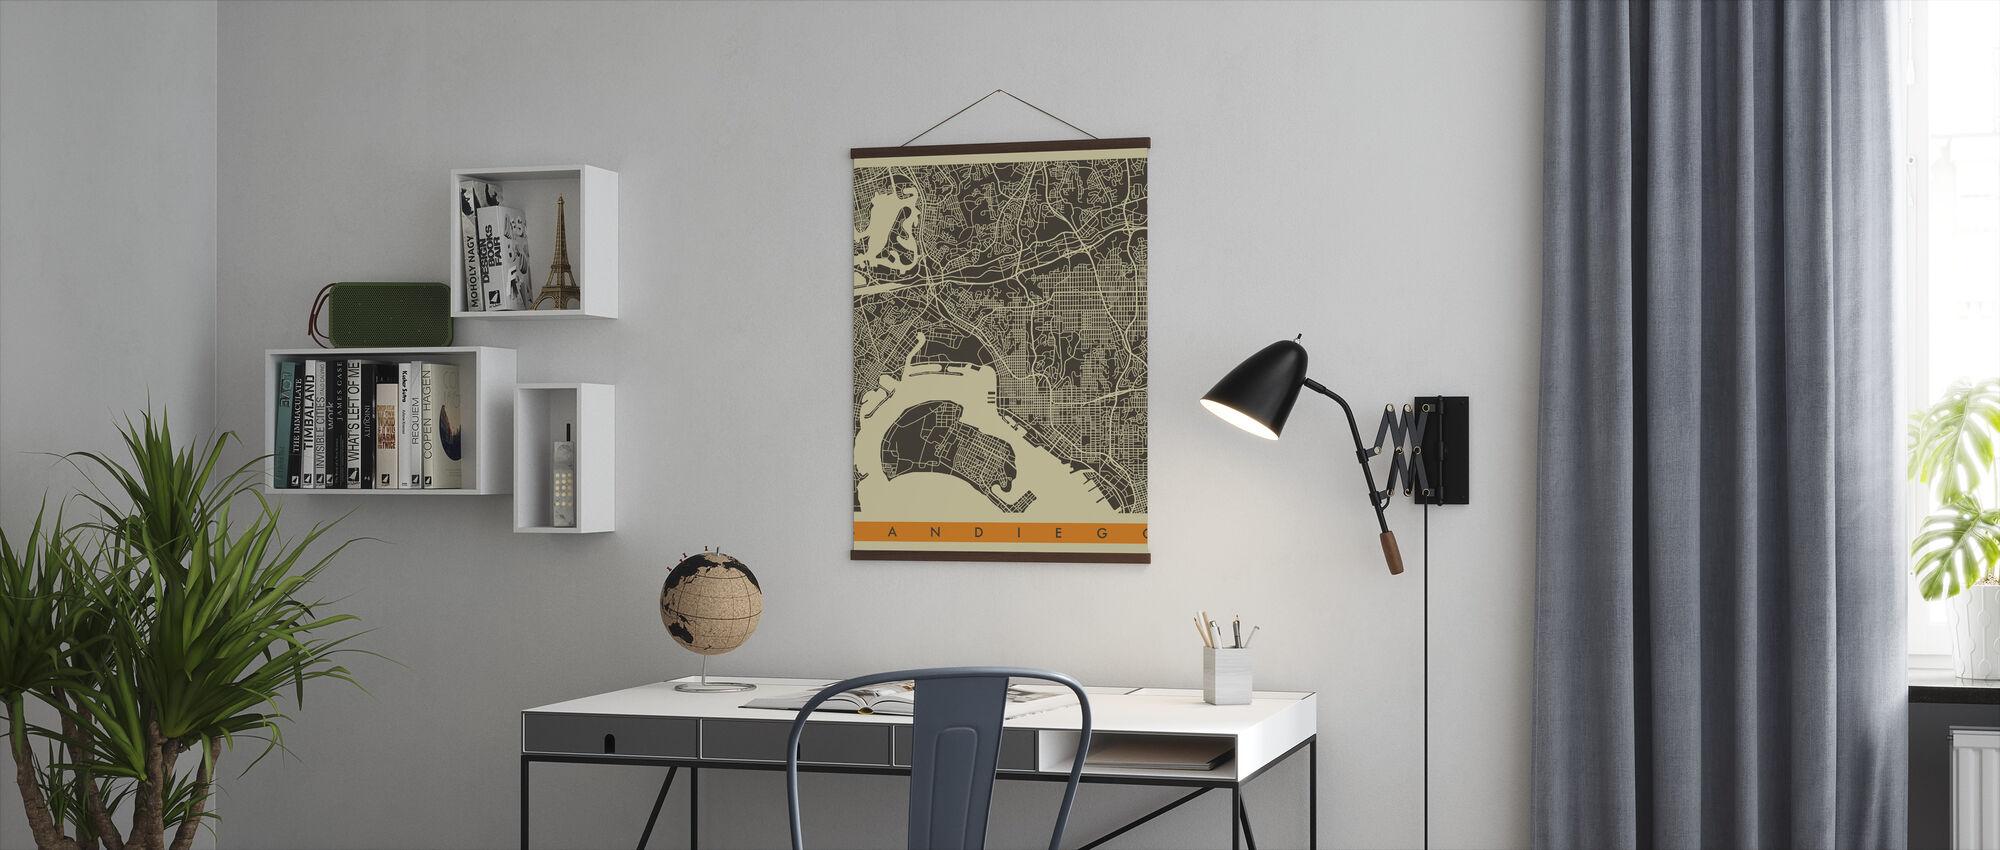 Bykart - San Diego - Plakat - Kontor